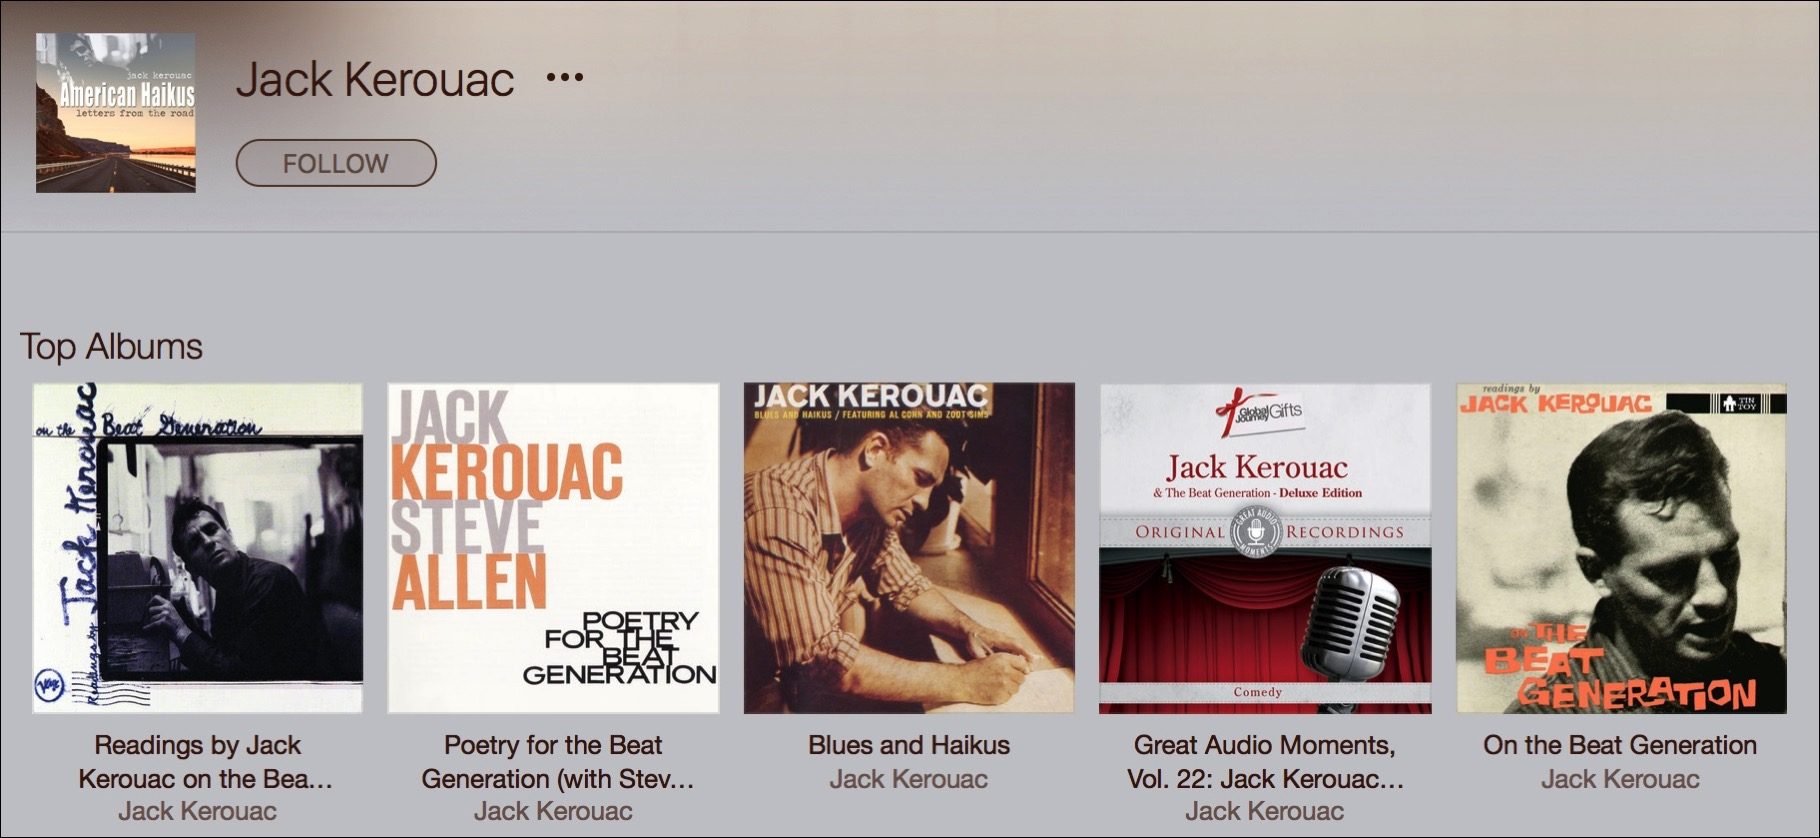 Kerouac apple music